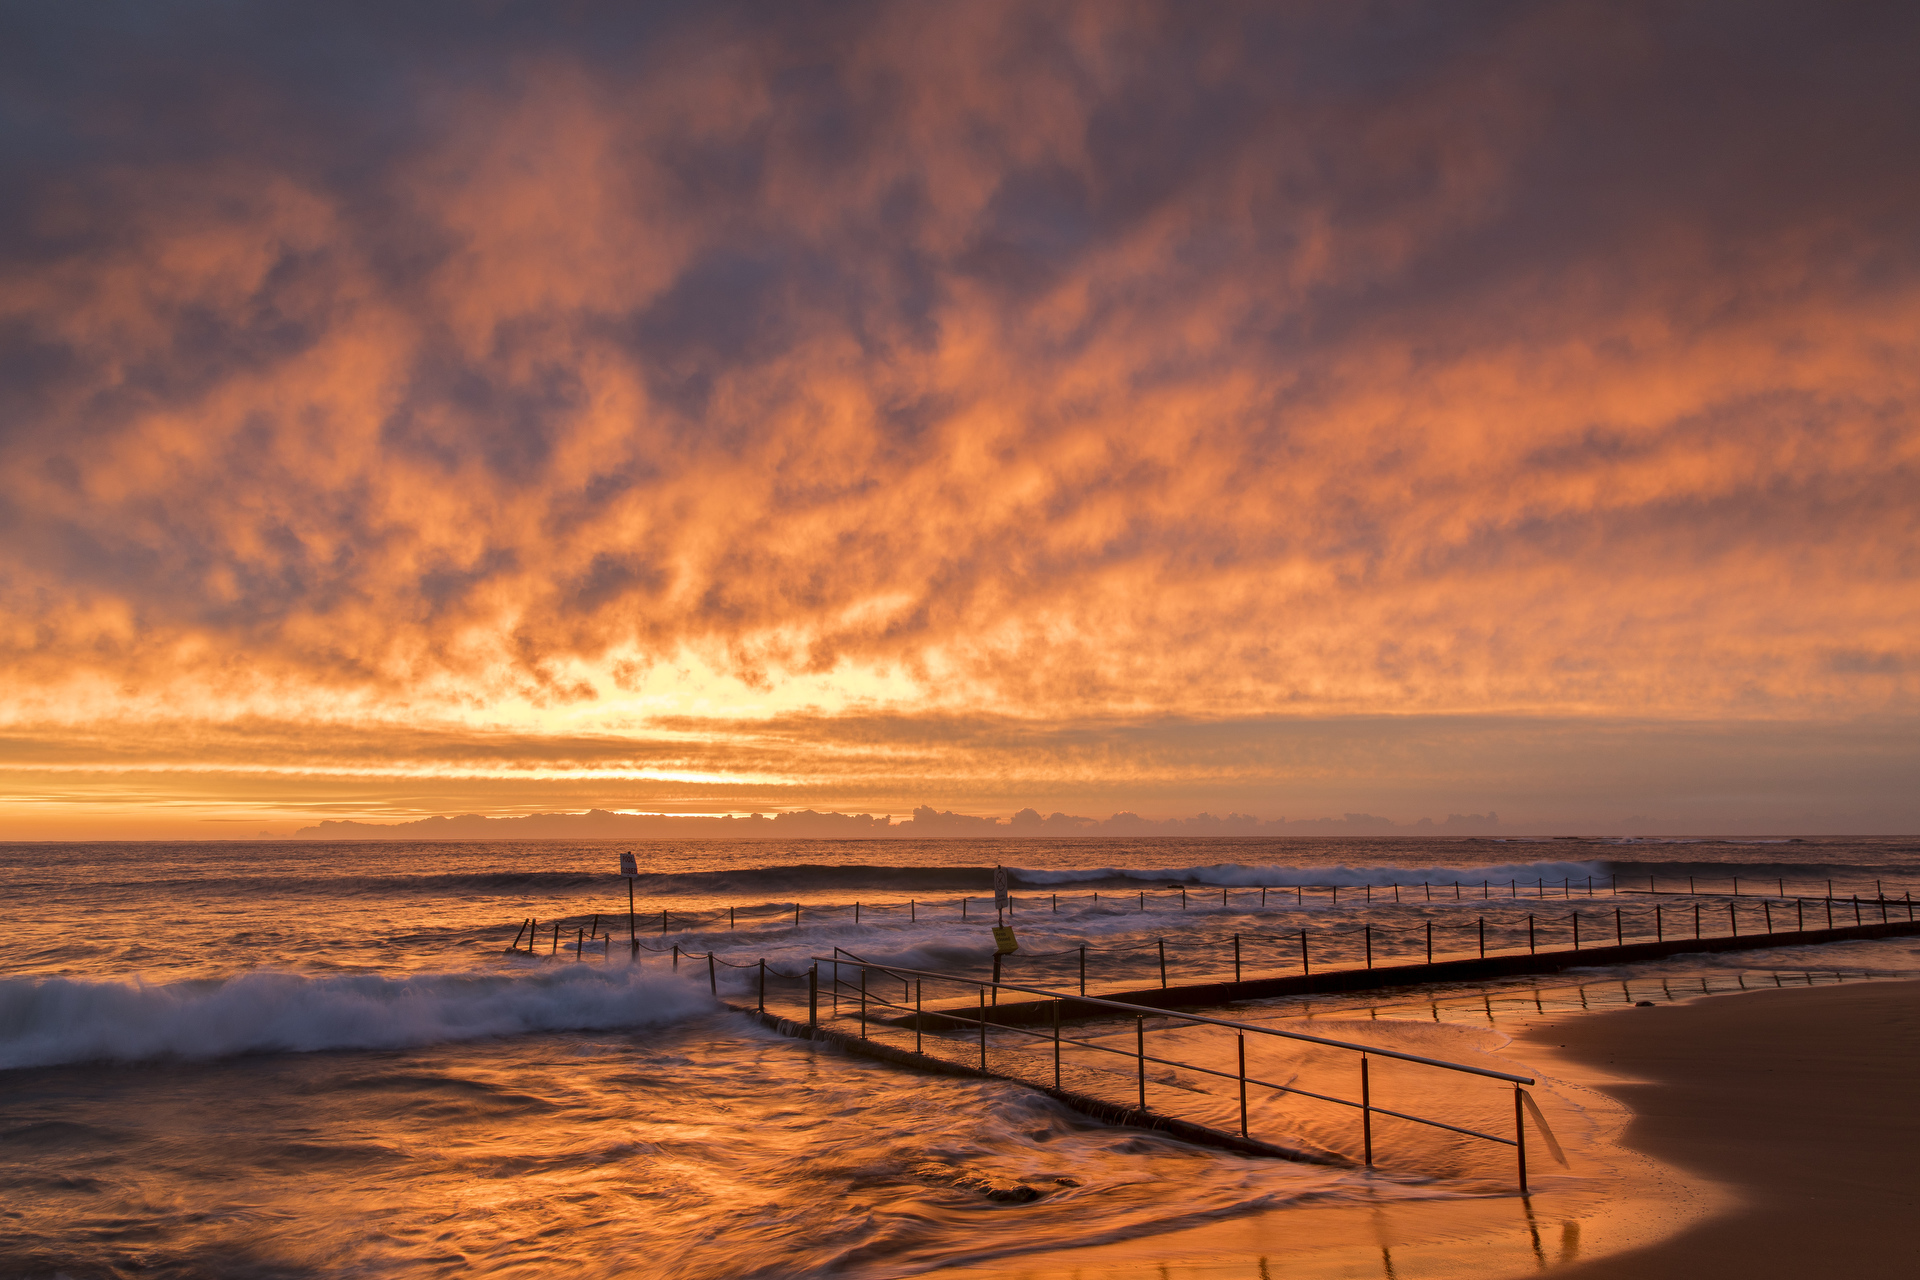 Sydney landscape photographer, sunrise, sunset, ocean, ocean pool, While you were sleeping,landscape, award winning, travel, NSW, Australia, sea, fine art prints, Newport